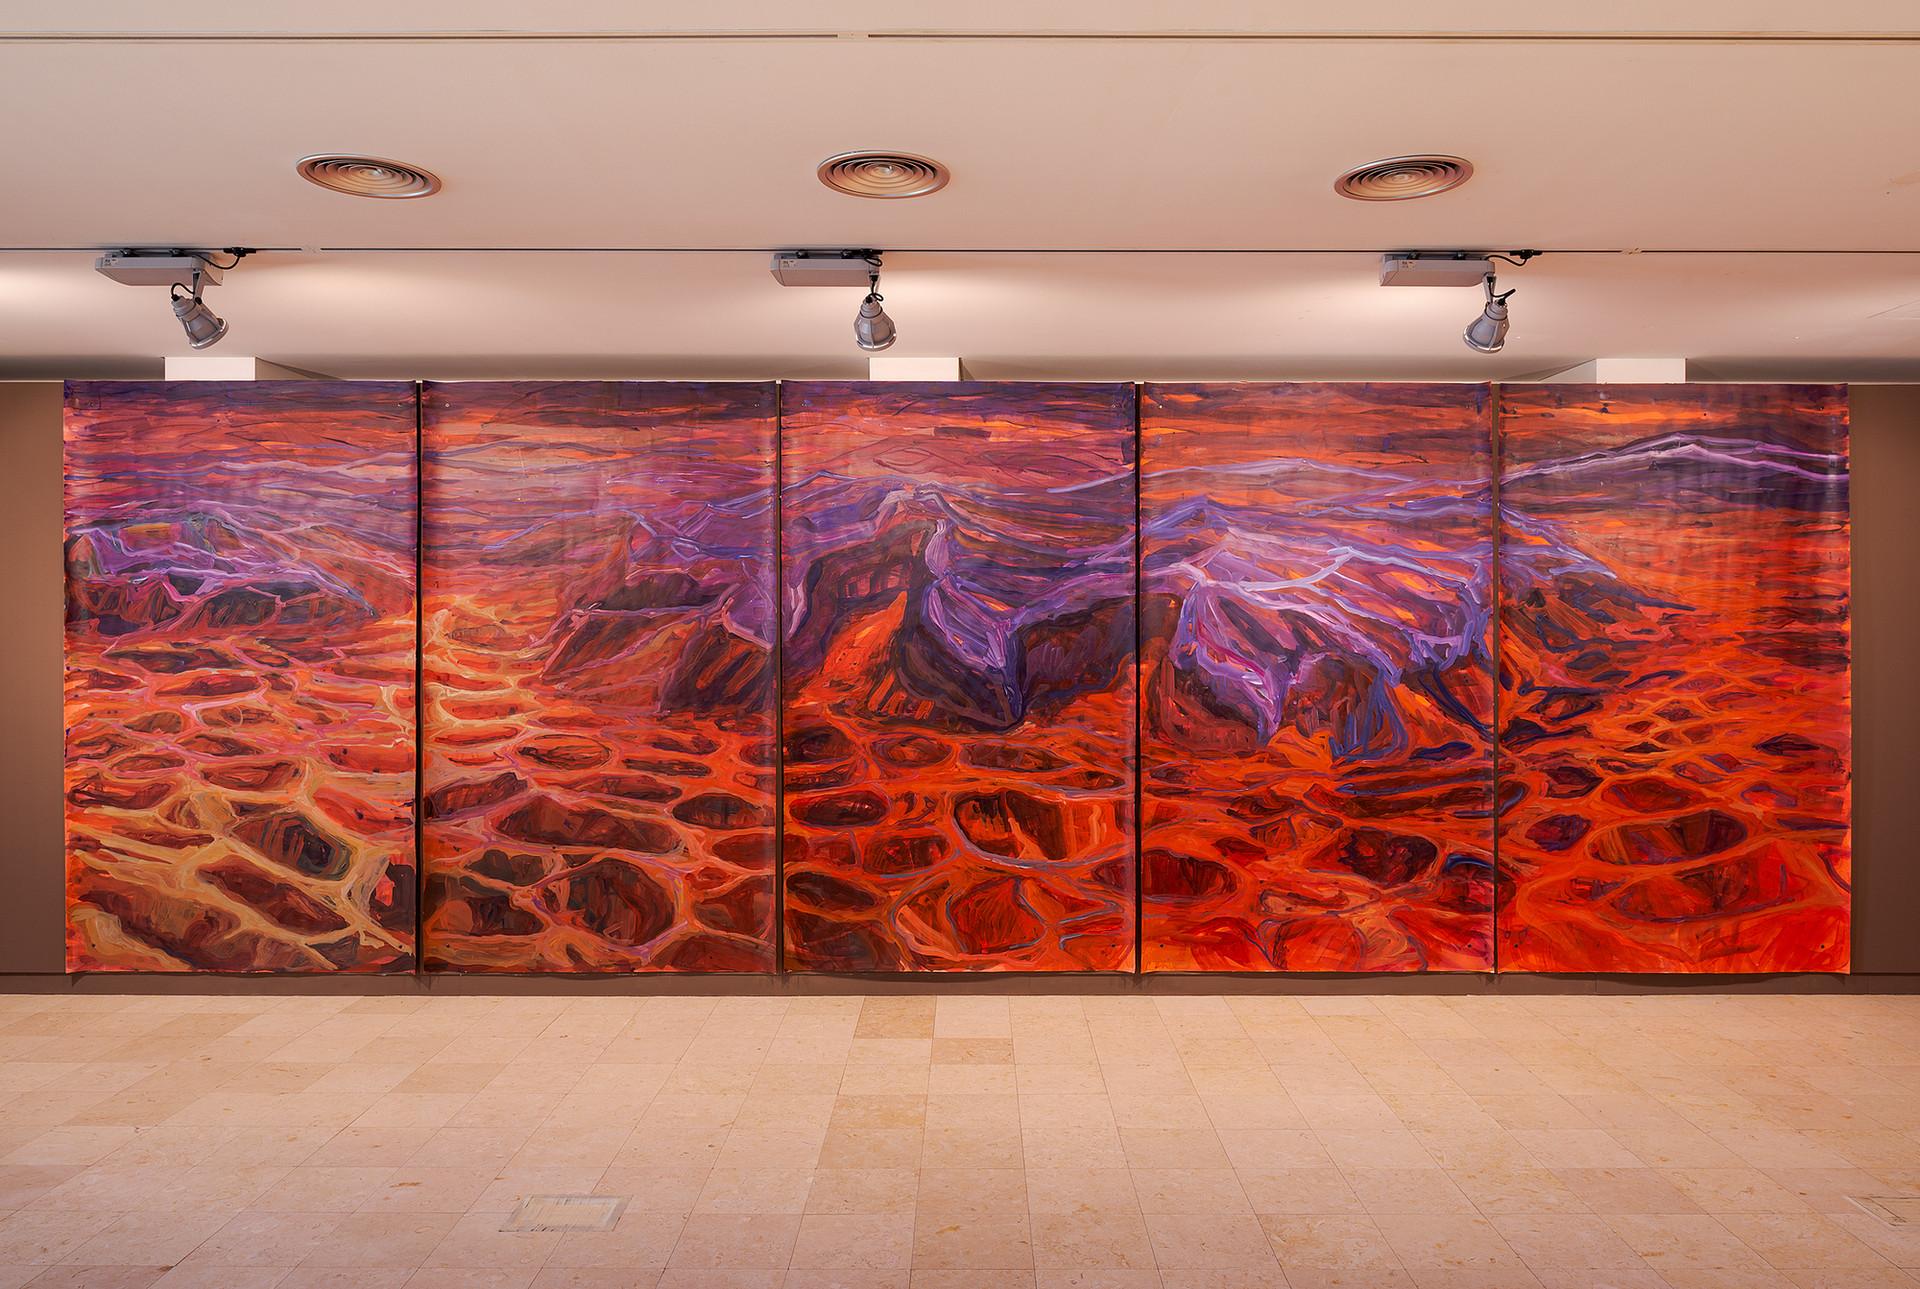 Liquid Sand #2, acrylic on watercolor paper, 250 x 750 cm. Exhibition view. DMF 2020